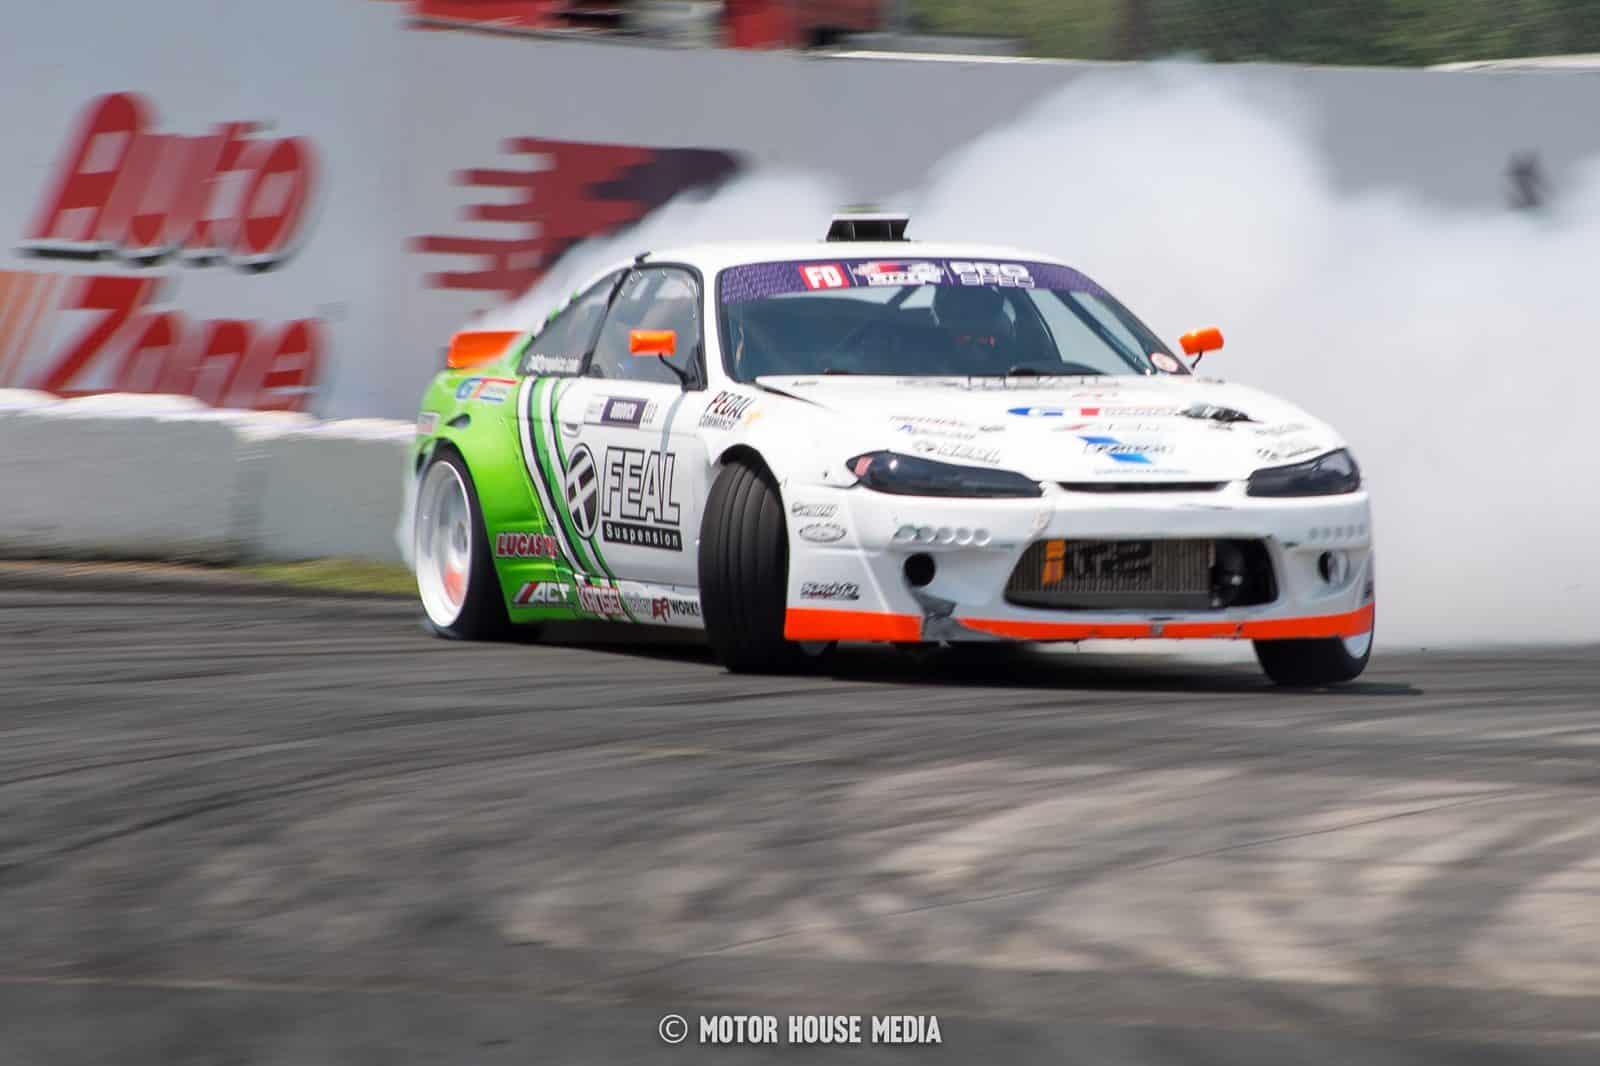 Evan Bogovich in his Feal suspension Formula Drift car